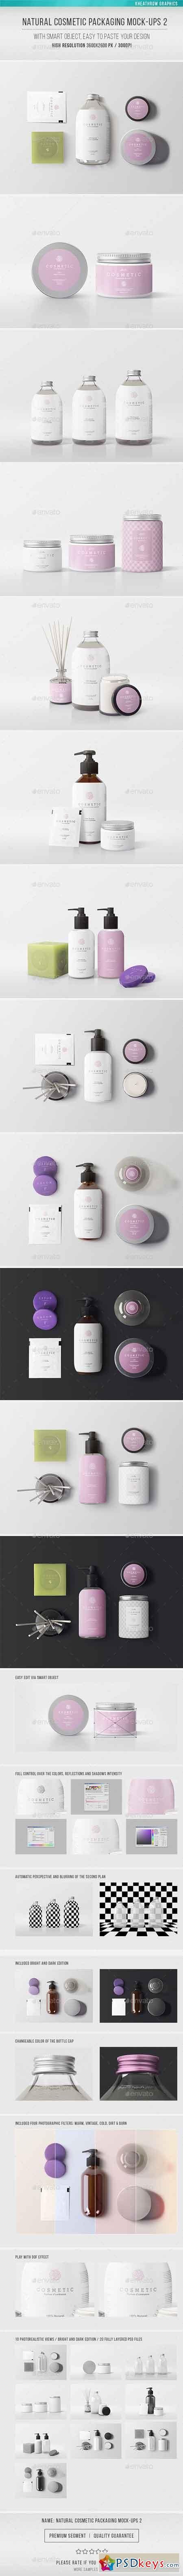 Natural Cosmetic Packaging Mock-Ups 2 17337833